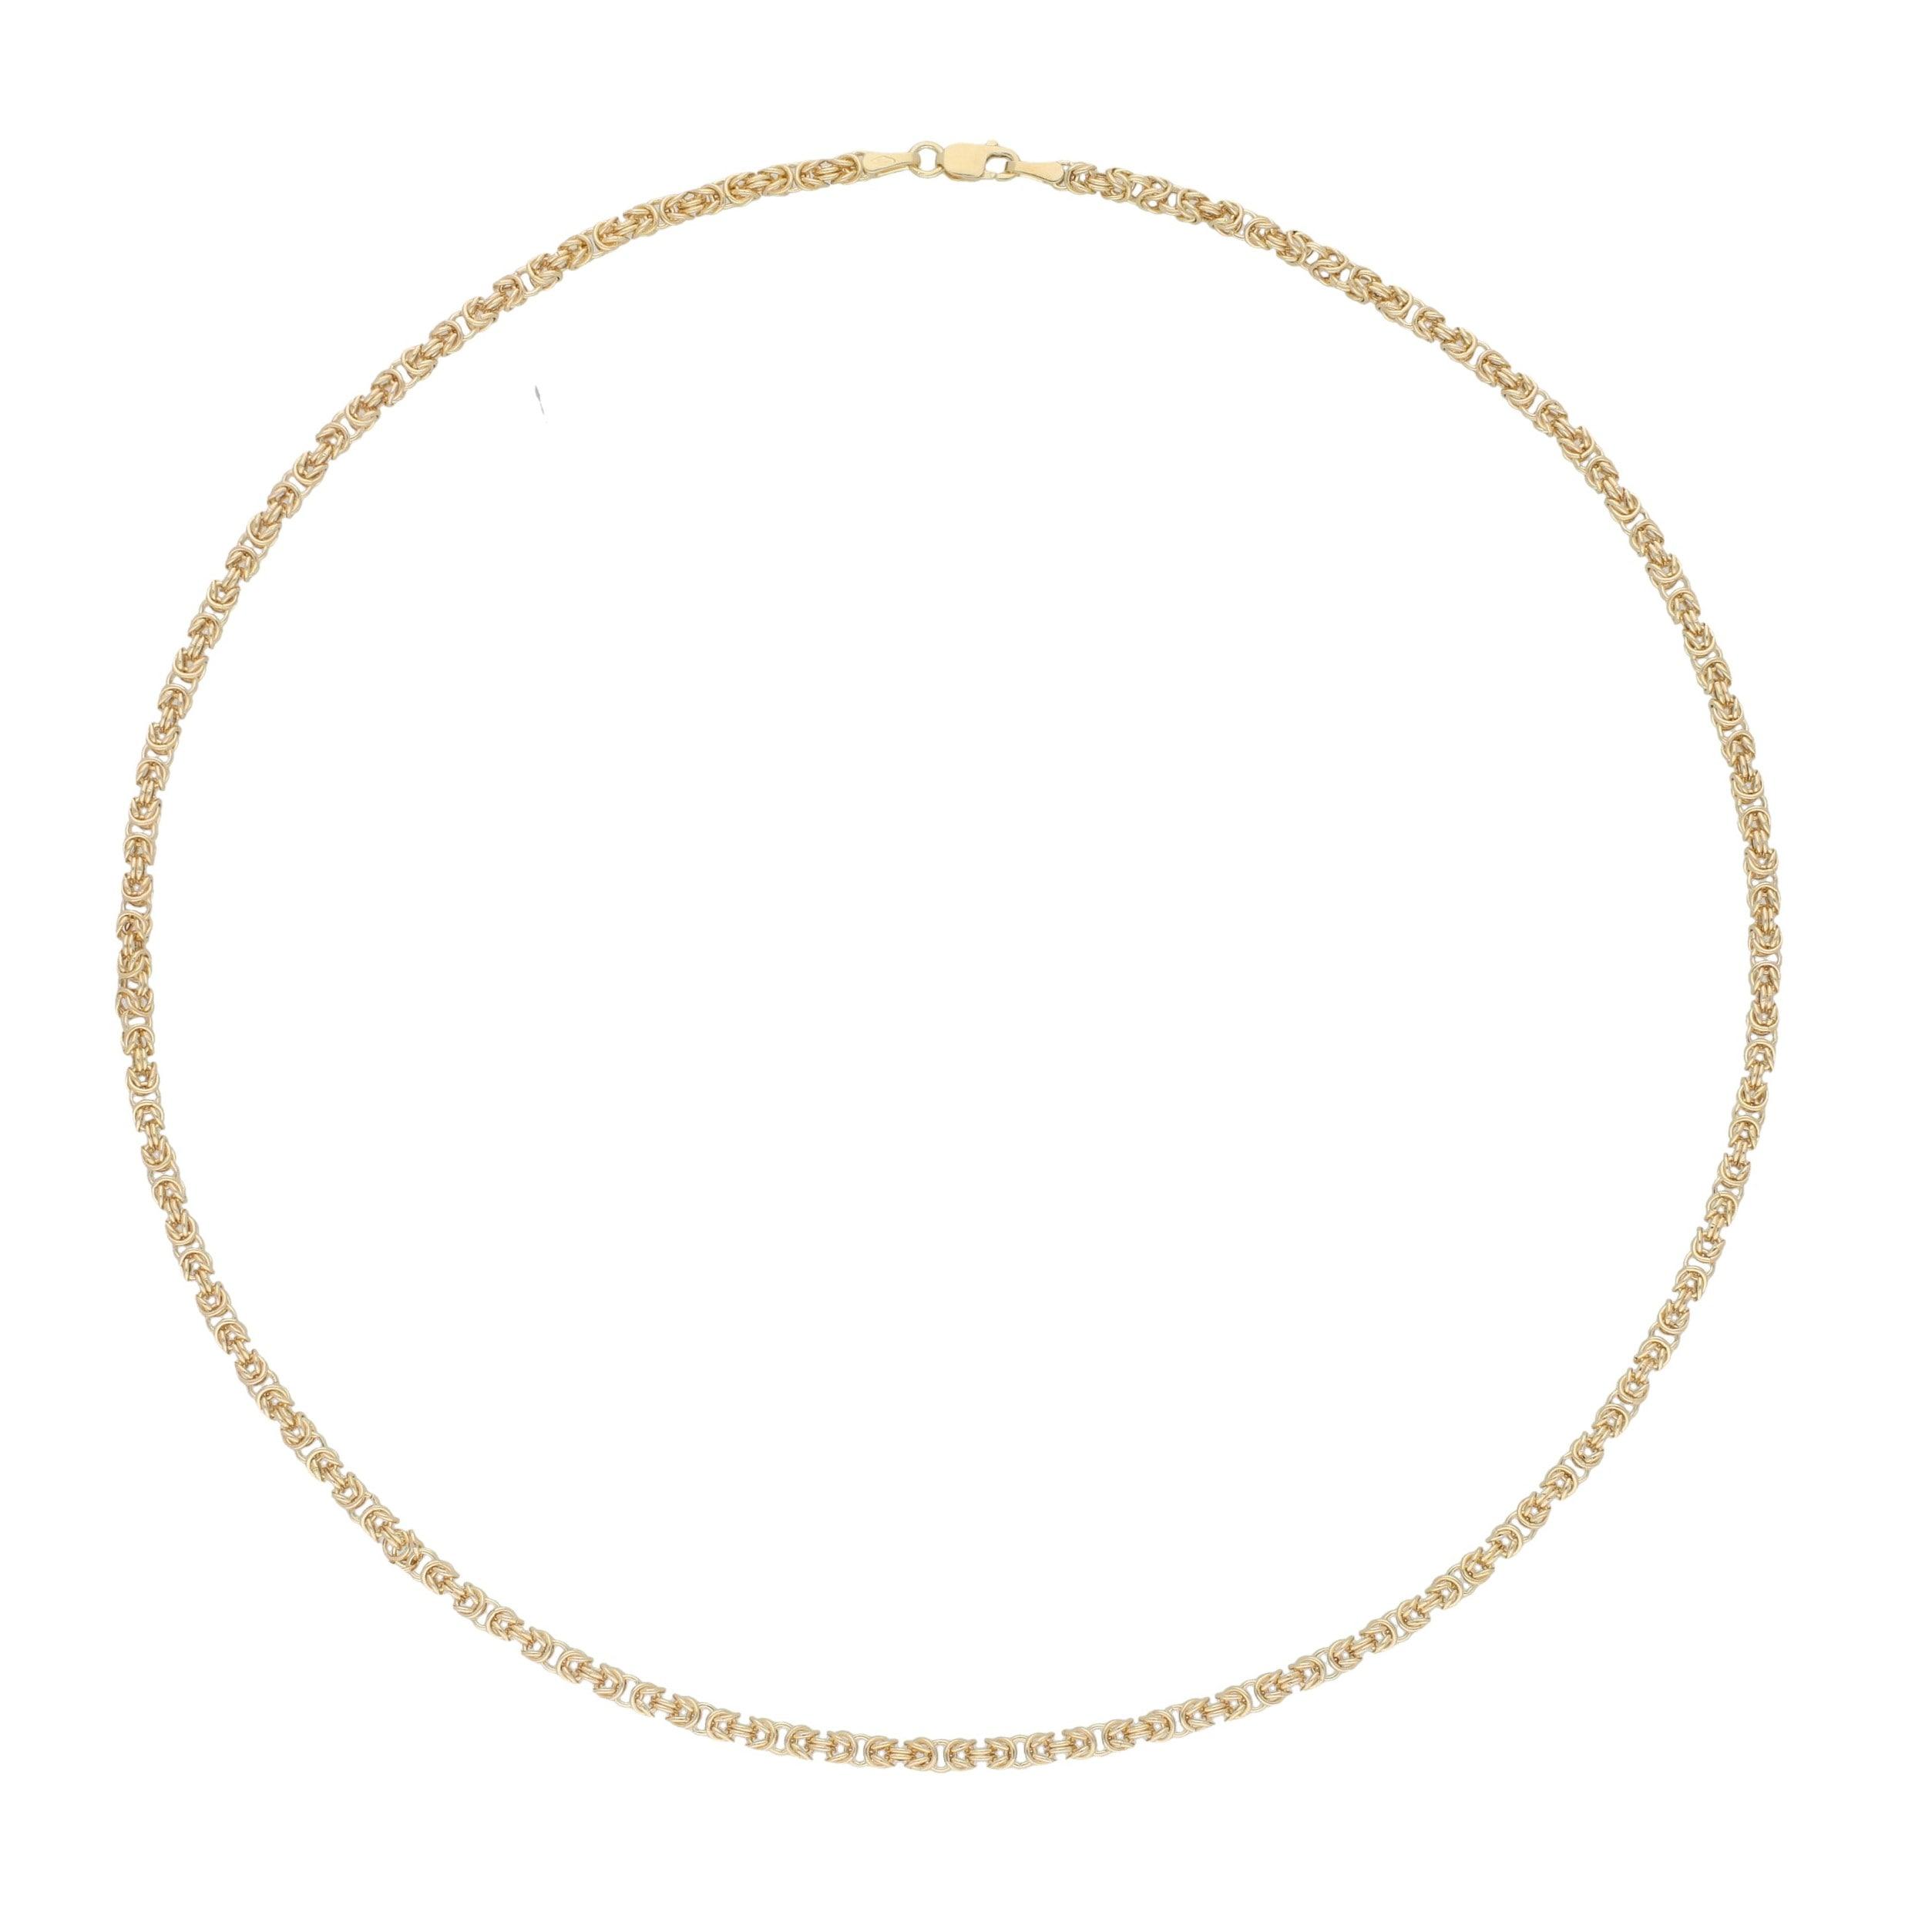 Vivance Königskette glamorous elegance | Schmuck > Halsketten > Königsketten | Vivance